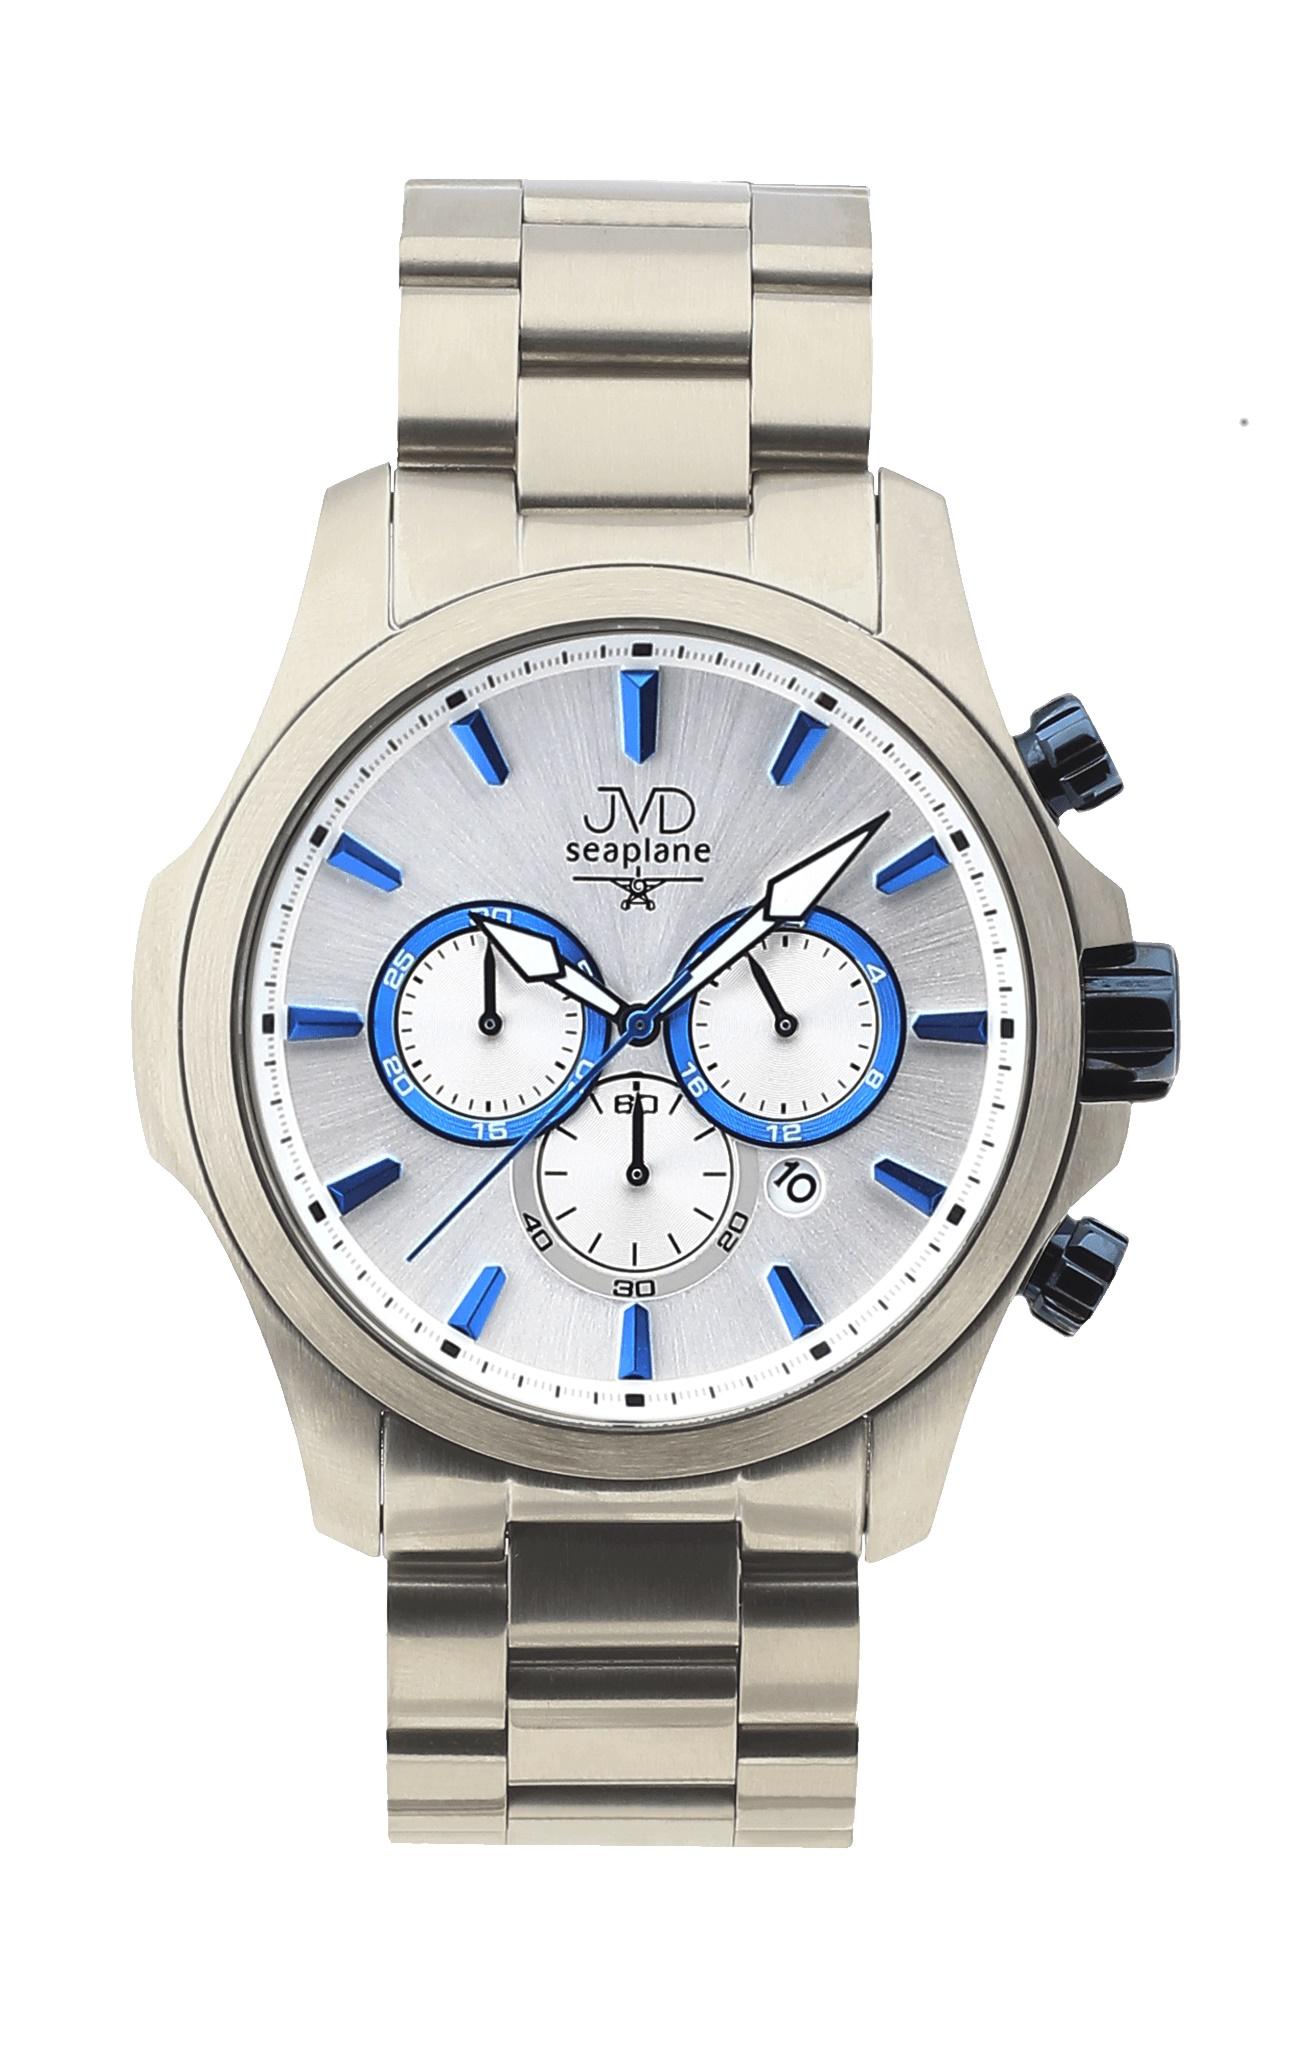 Vysoce odolné vodotěsné chronografy hodinky JVD Seaplane CORE JC704.1 - 10ATM (POŠTOVNÉ ZDARMA!!)